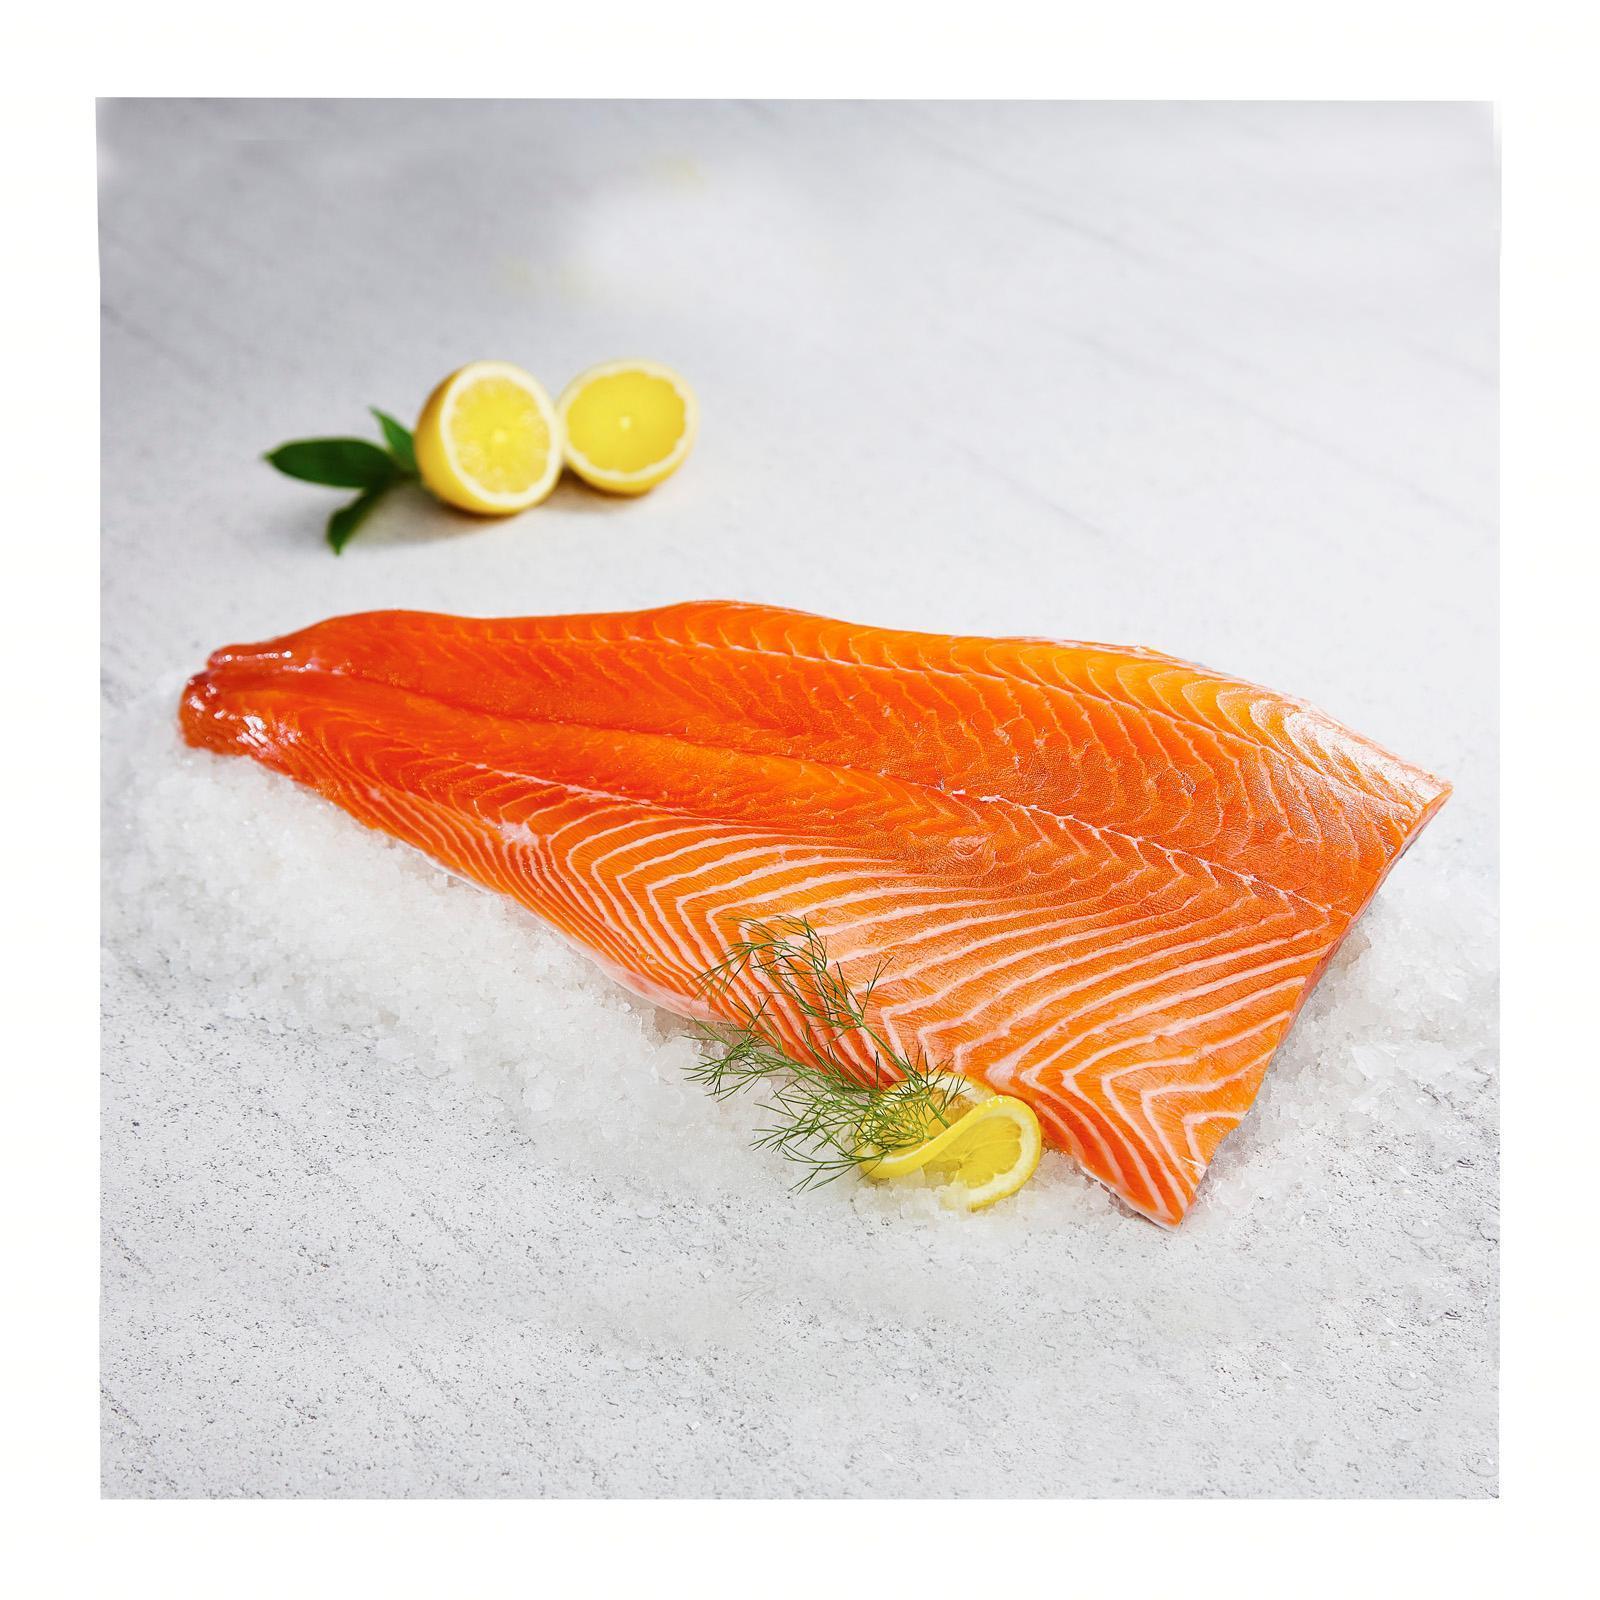 Kuhlbarra Salmon Fish Fillet - Norway